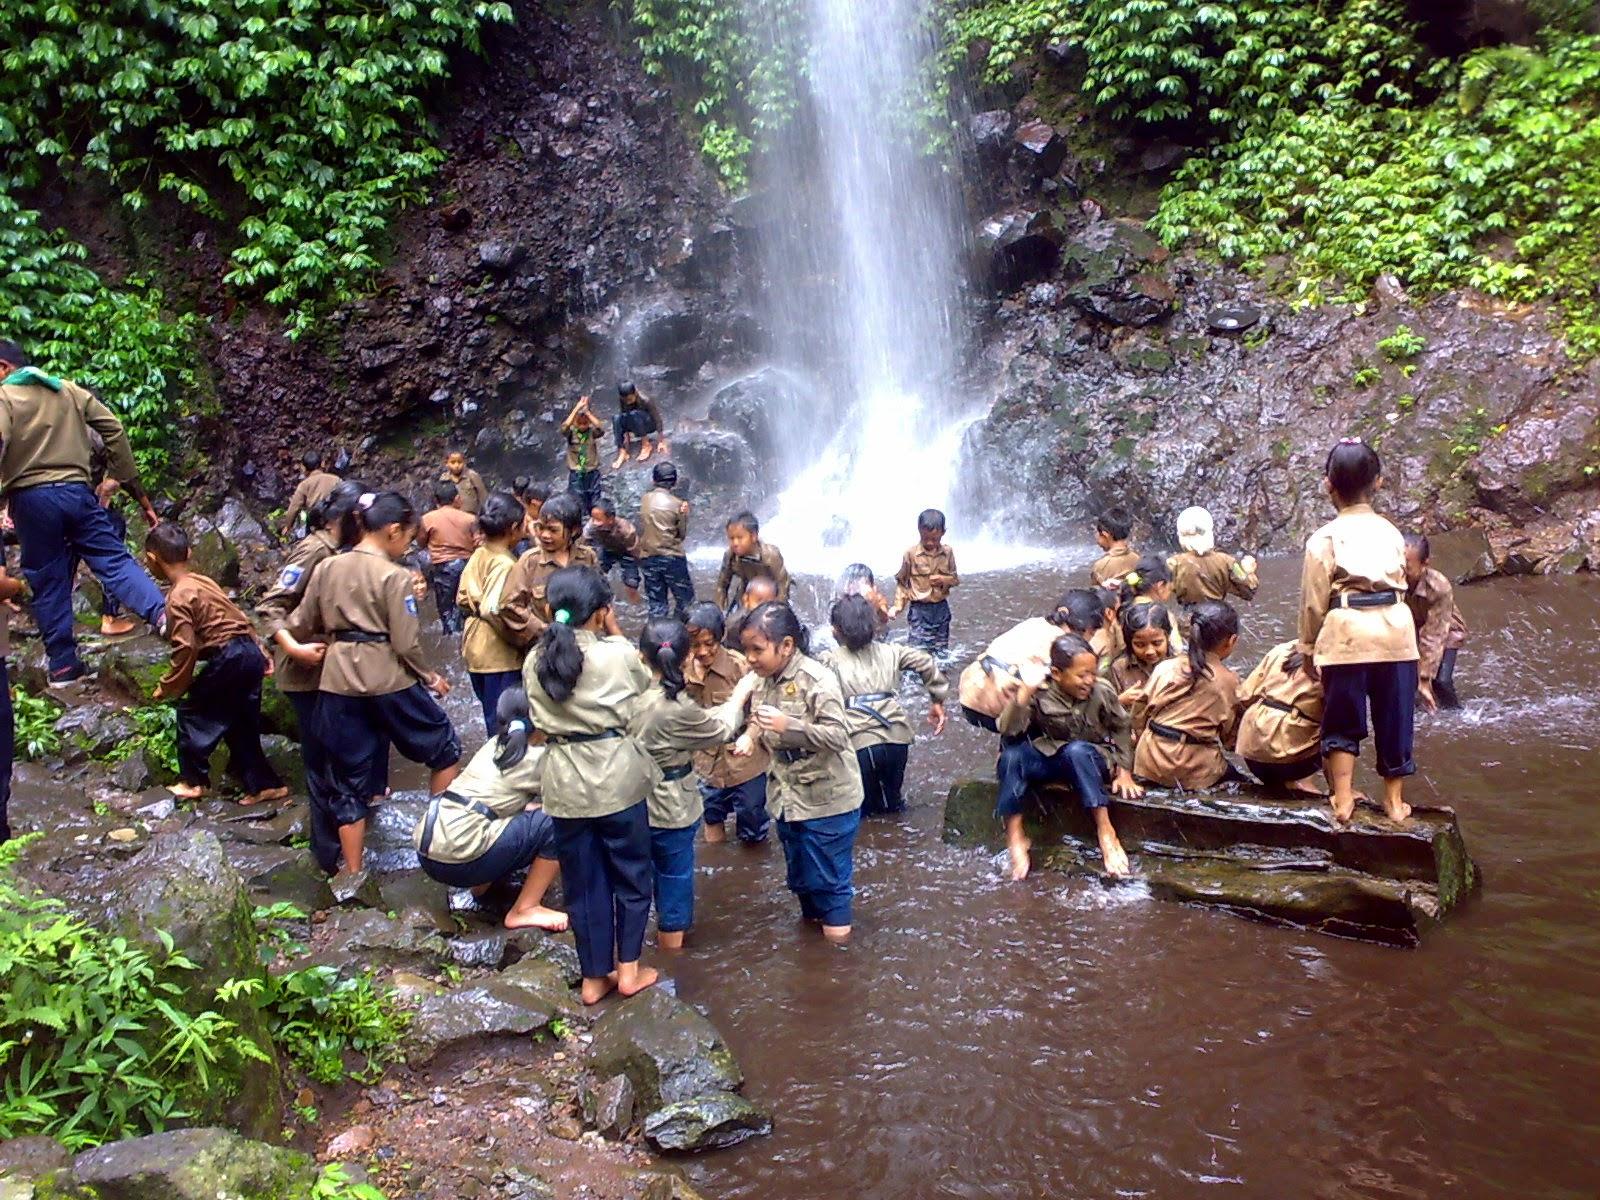 Wisata Trawas Mojokerto Air Terjun Dlundung Akhmad Faizal Reviews Alam